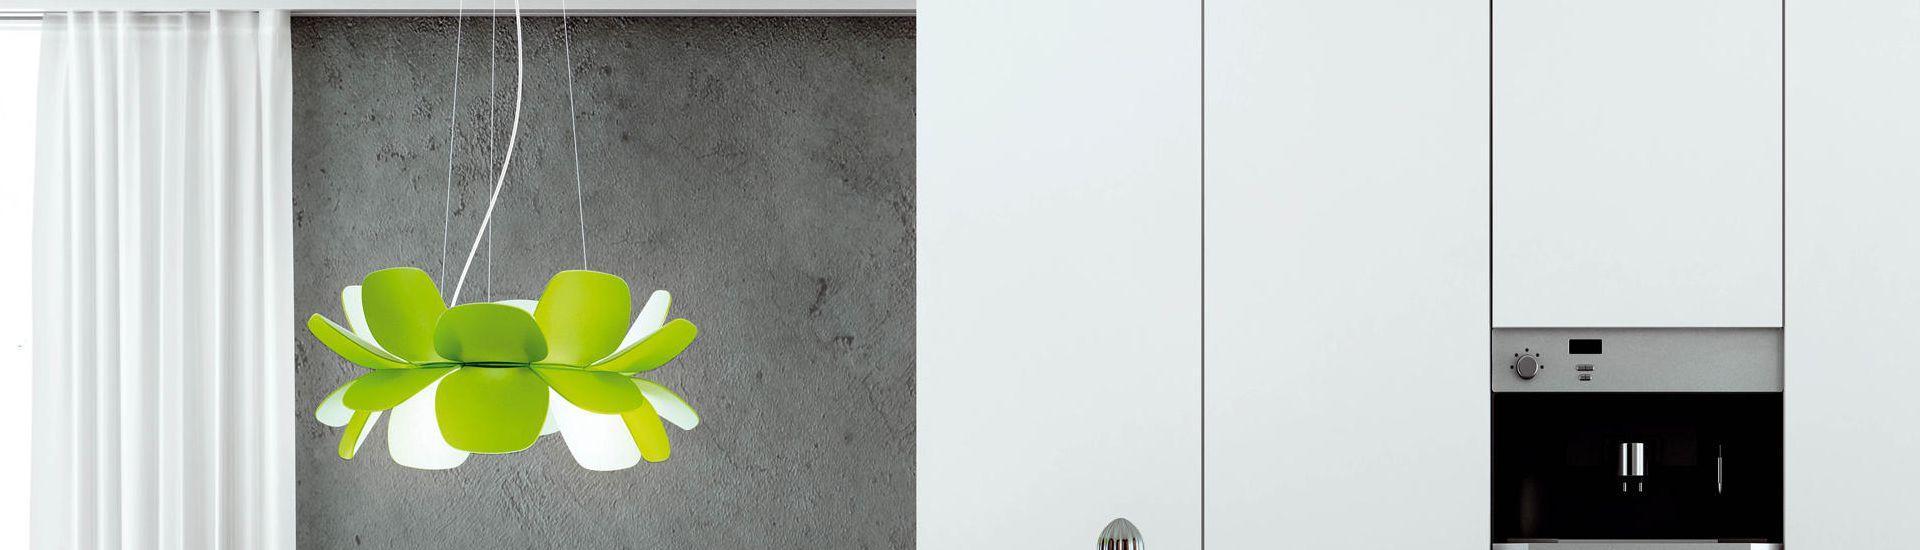 Infiore T 5805 Pendelleuchte ECO 120W Grün